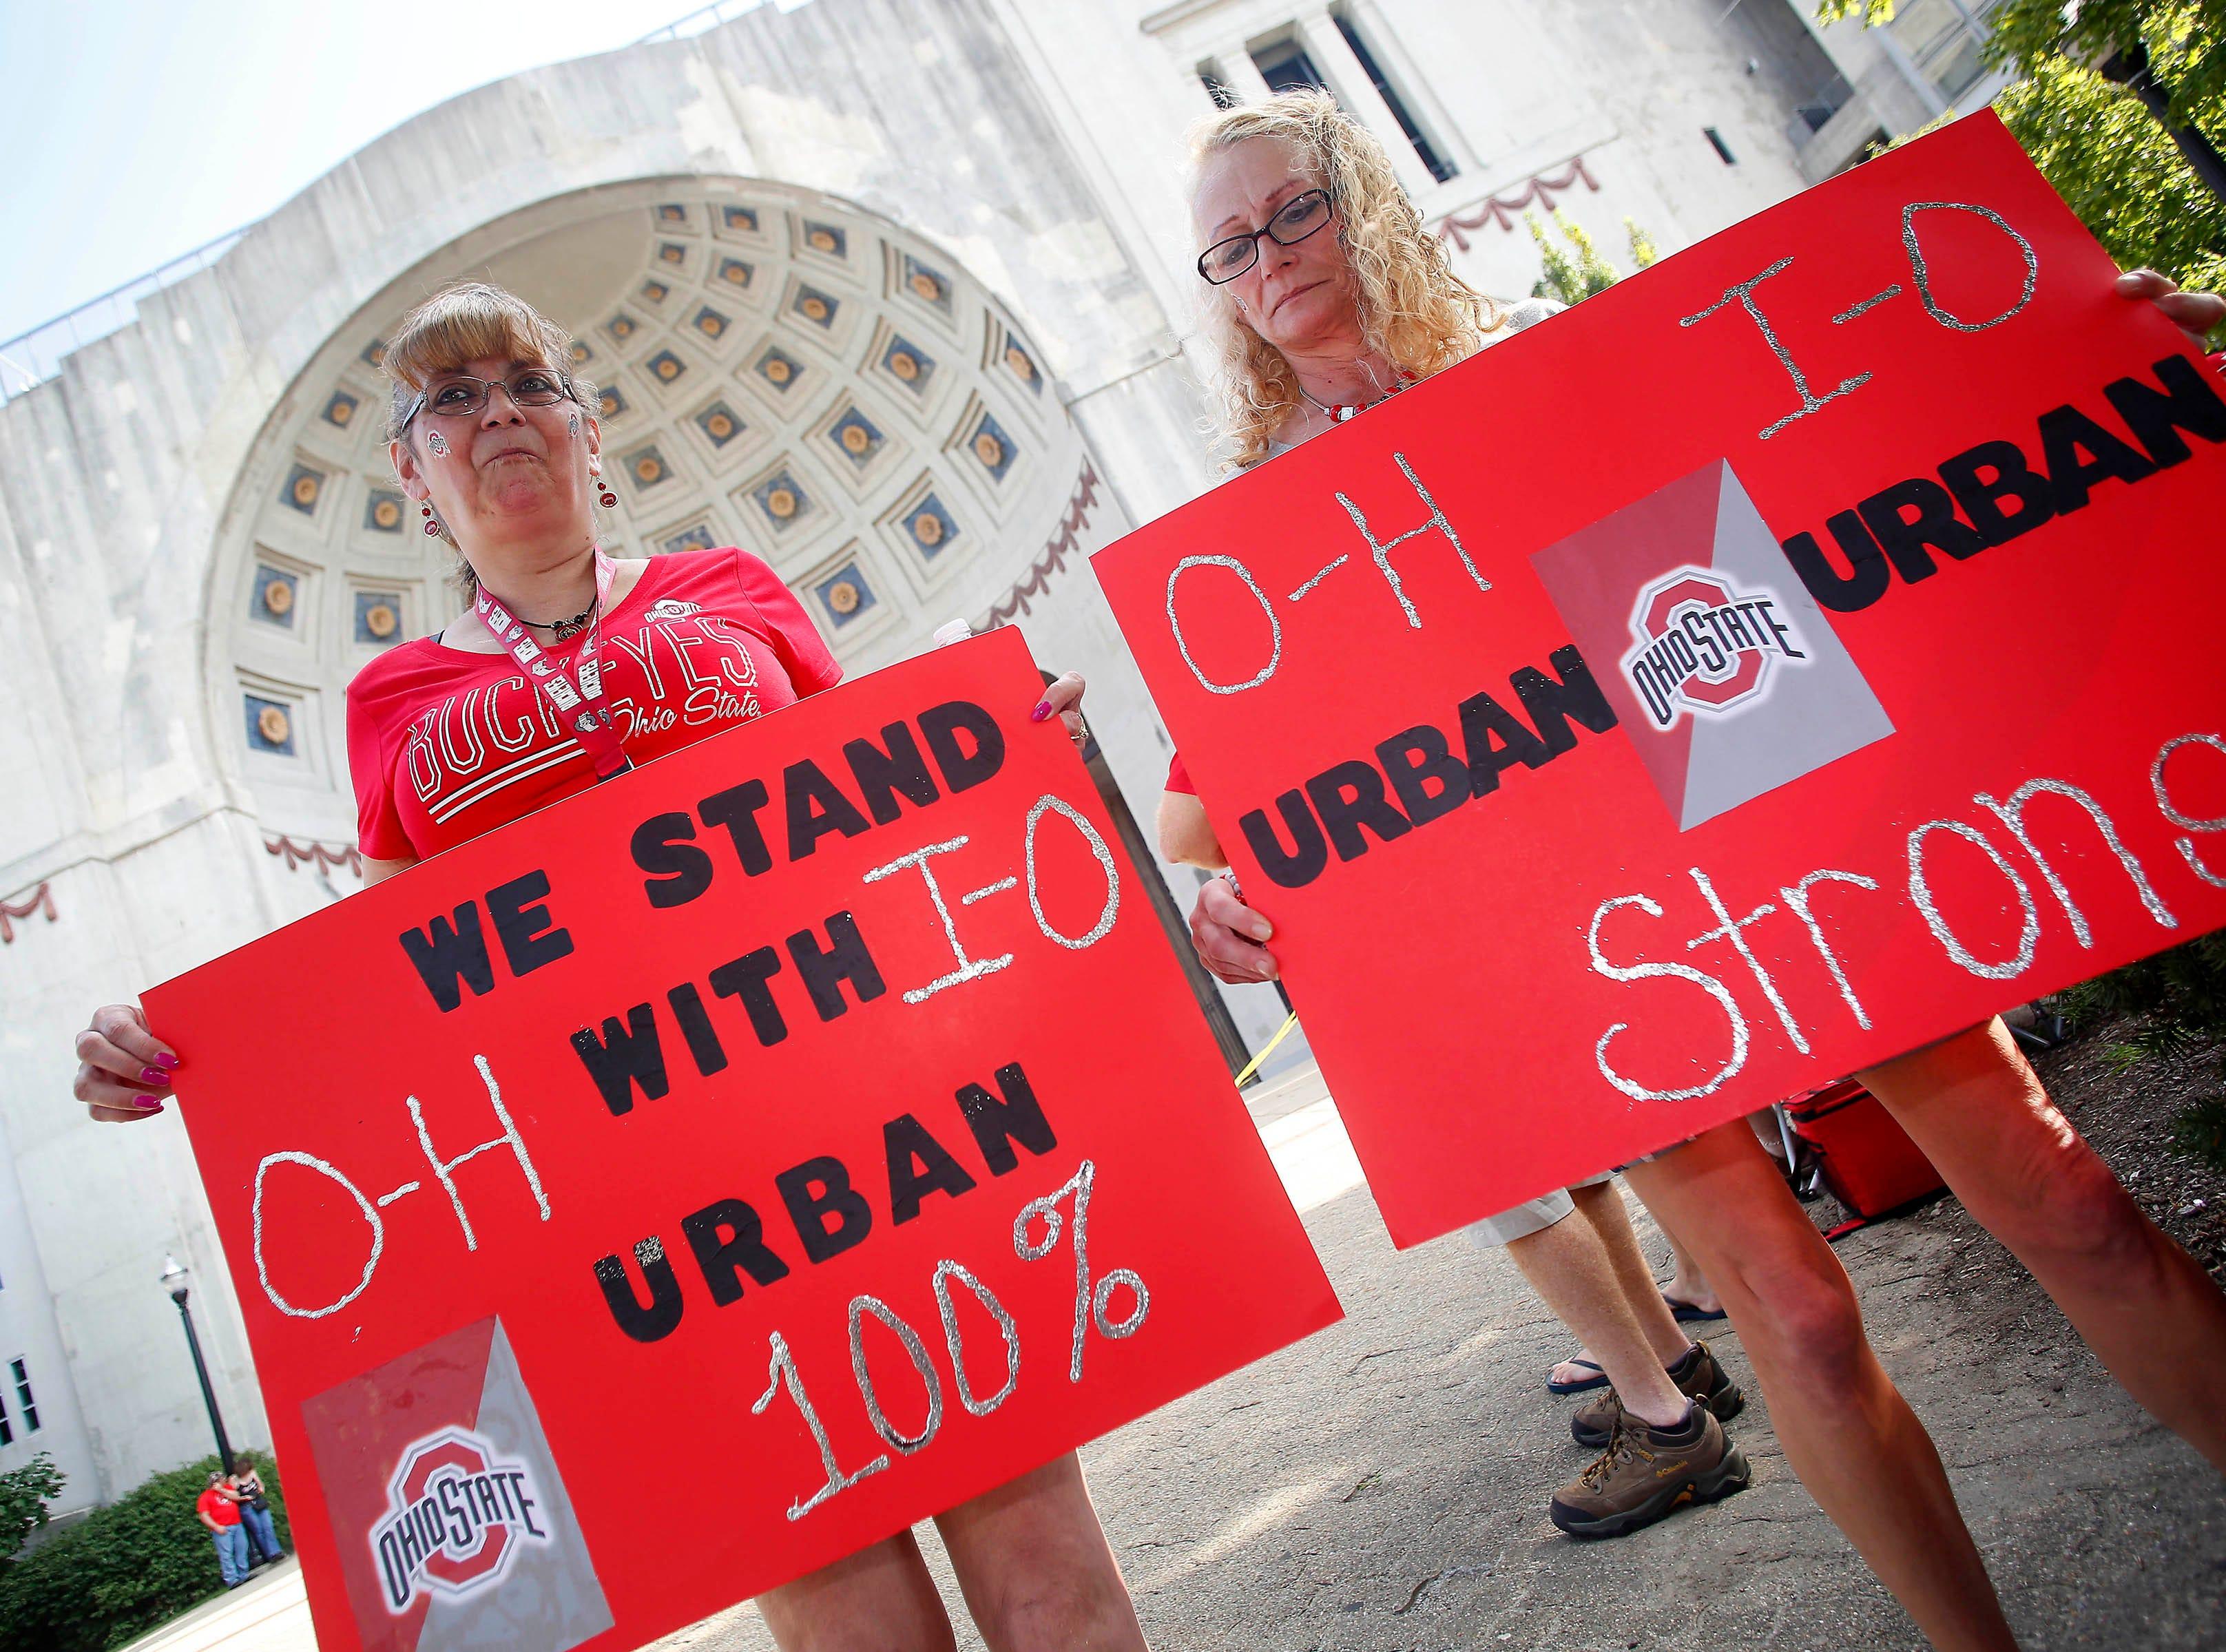 Tina Kear (left) and Lori Thompson of Upper Sandusky, Ohio, support Ohio State coach Urban Meyer at a rally held at Ohio Stadium.